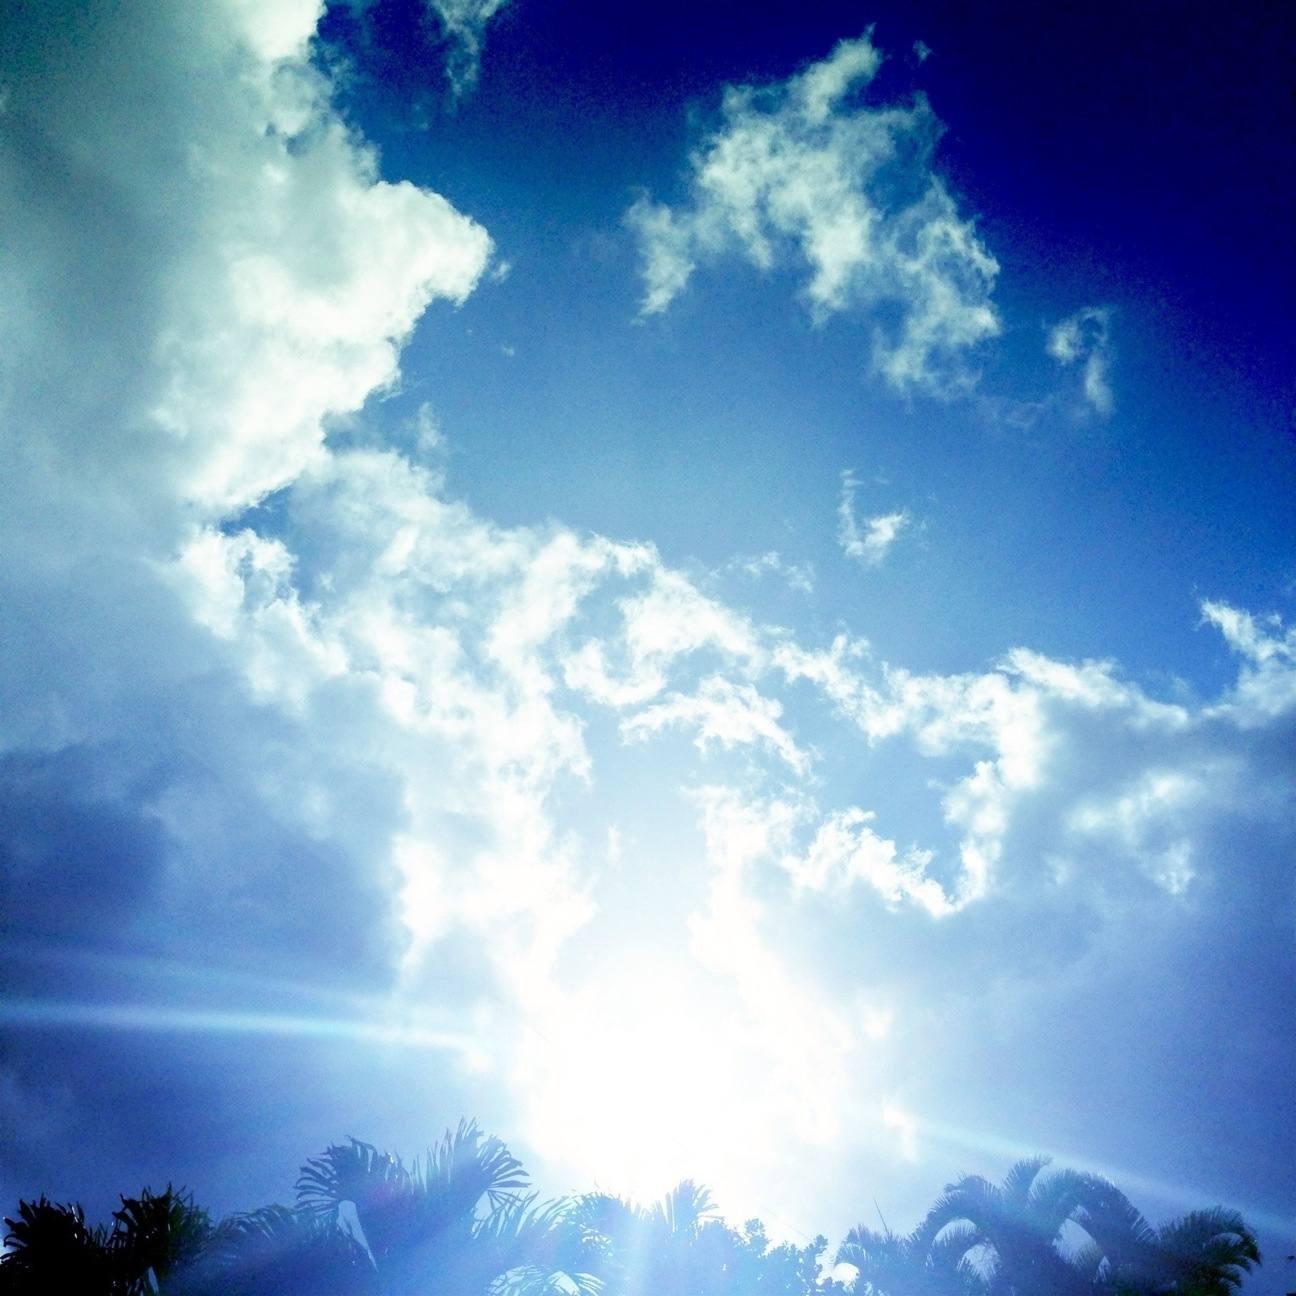 Un hermoso cielo